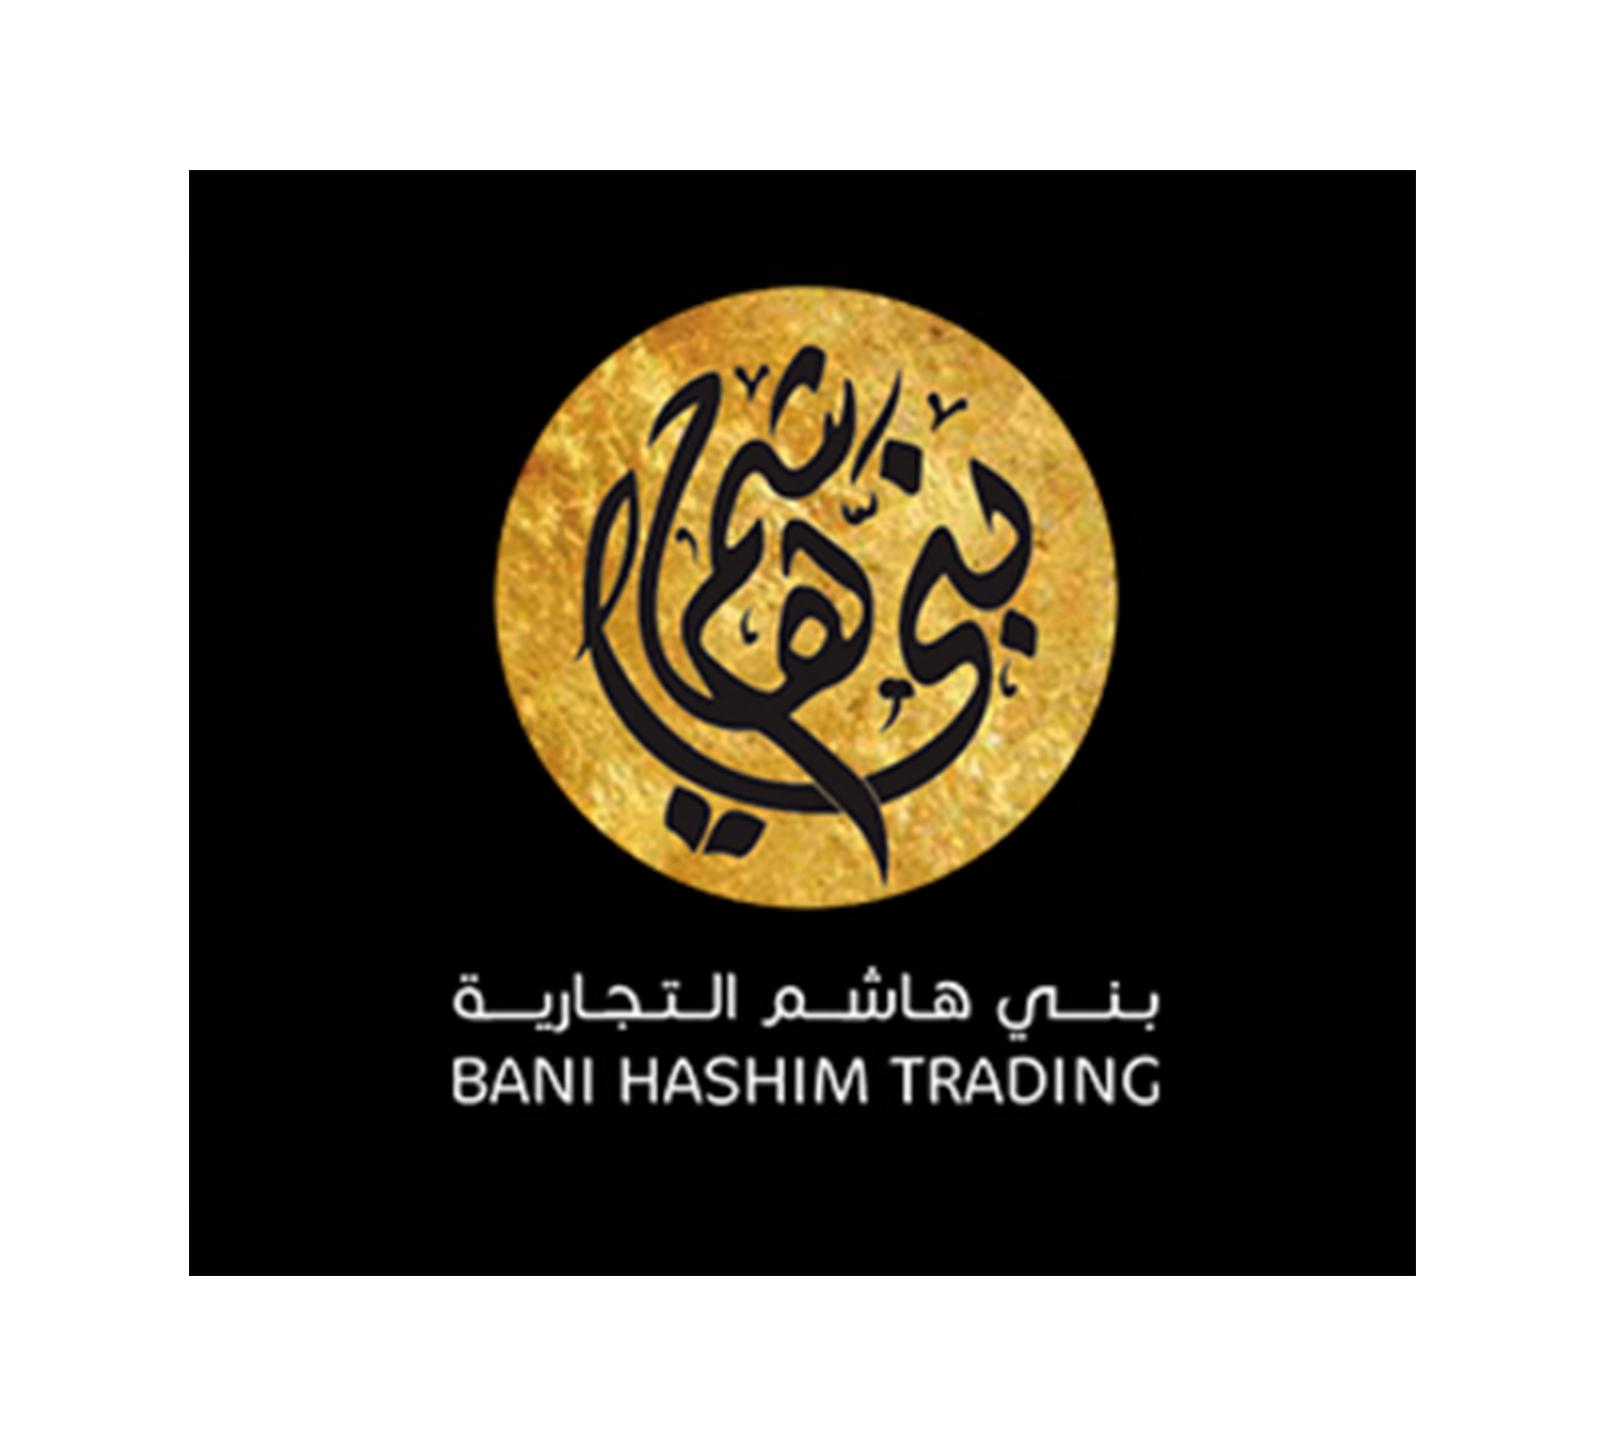 http://bhashim.com/